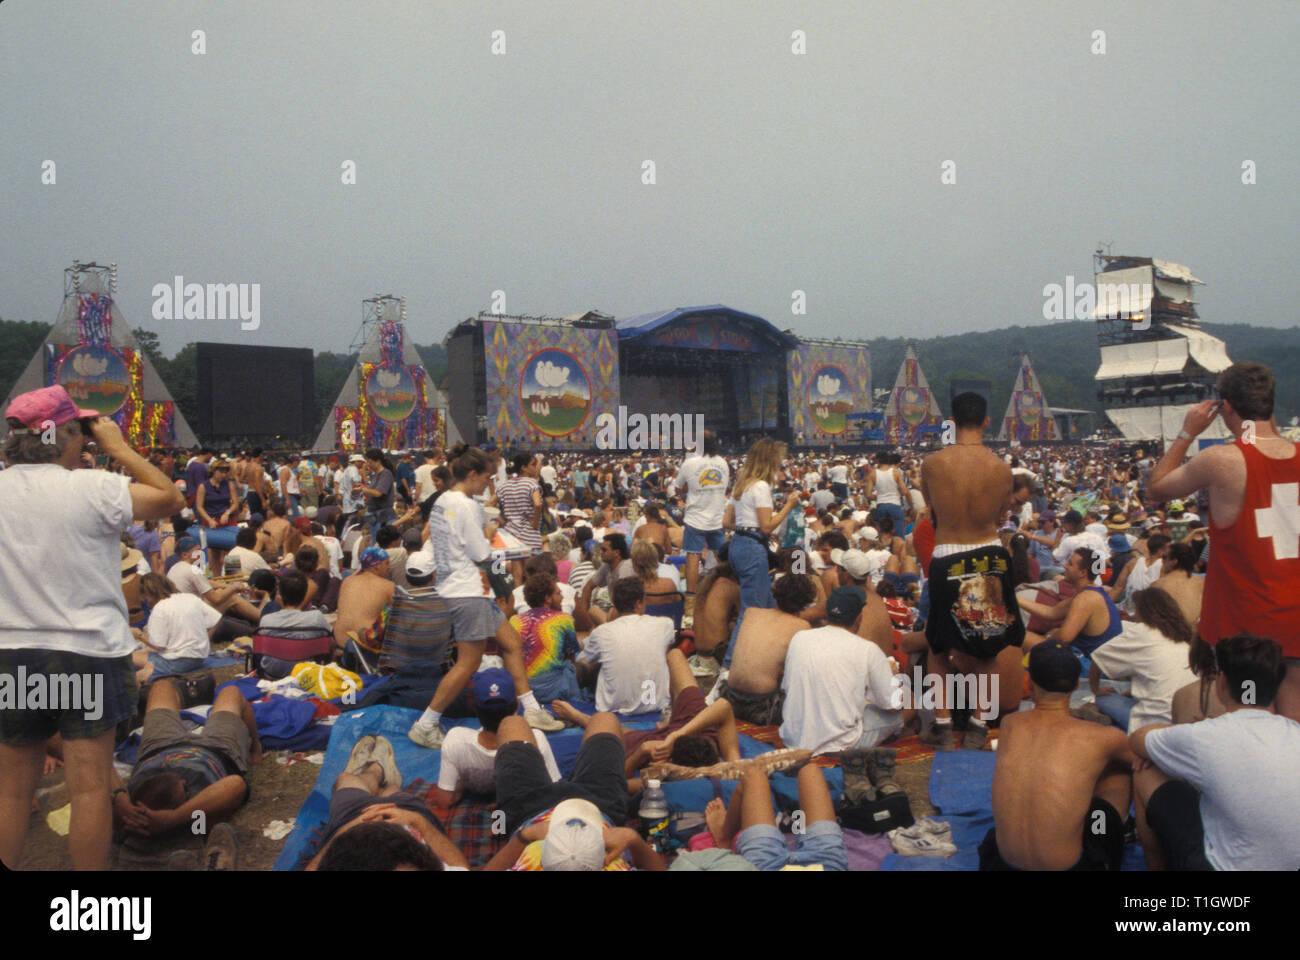 Woodstock 94 Photos & Woodstock 94 Images - Alamy